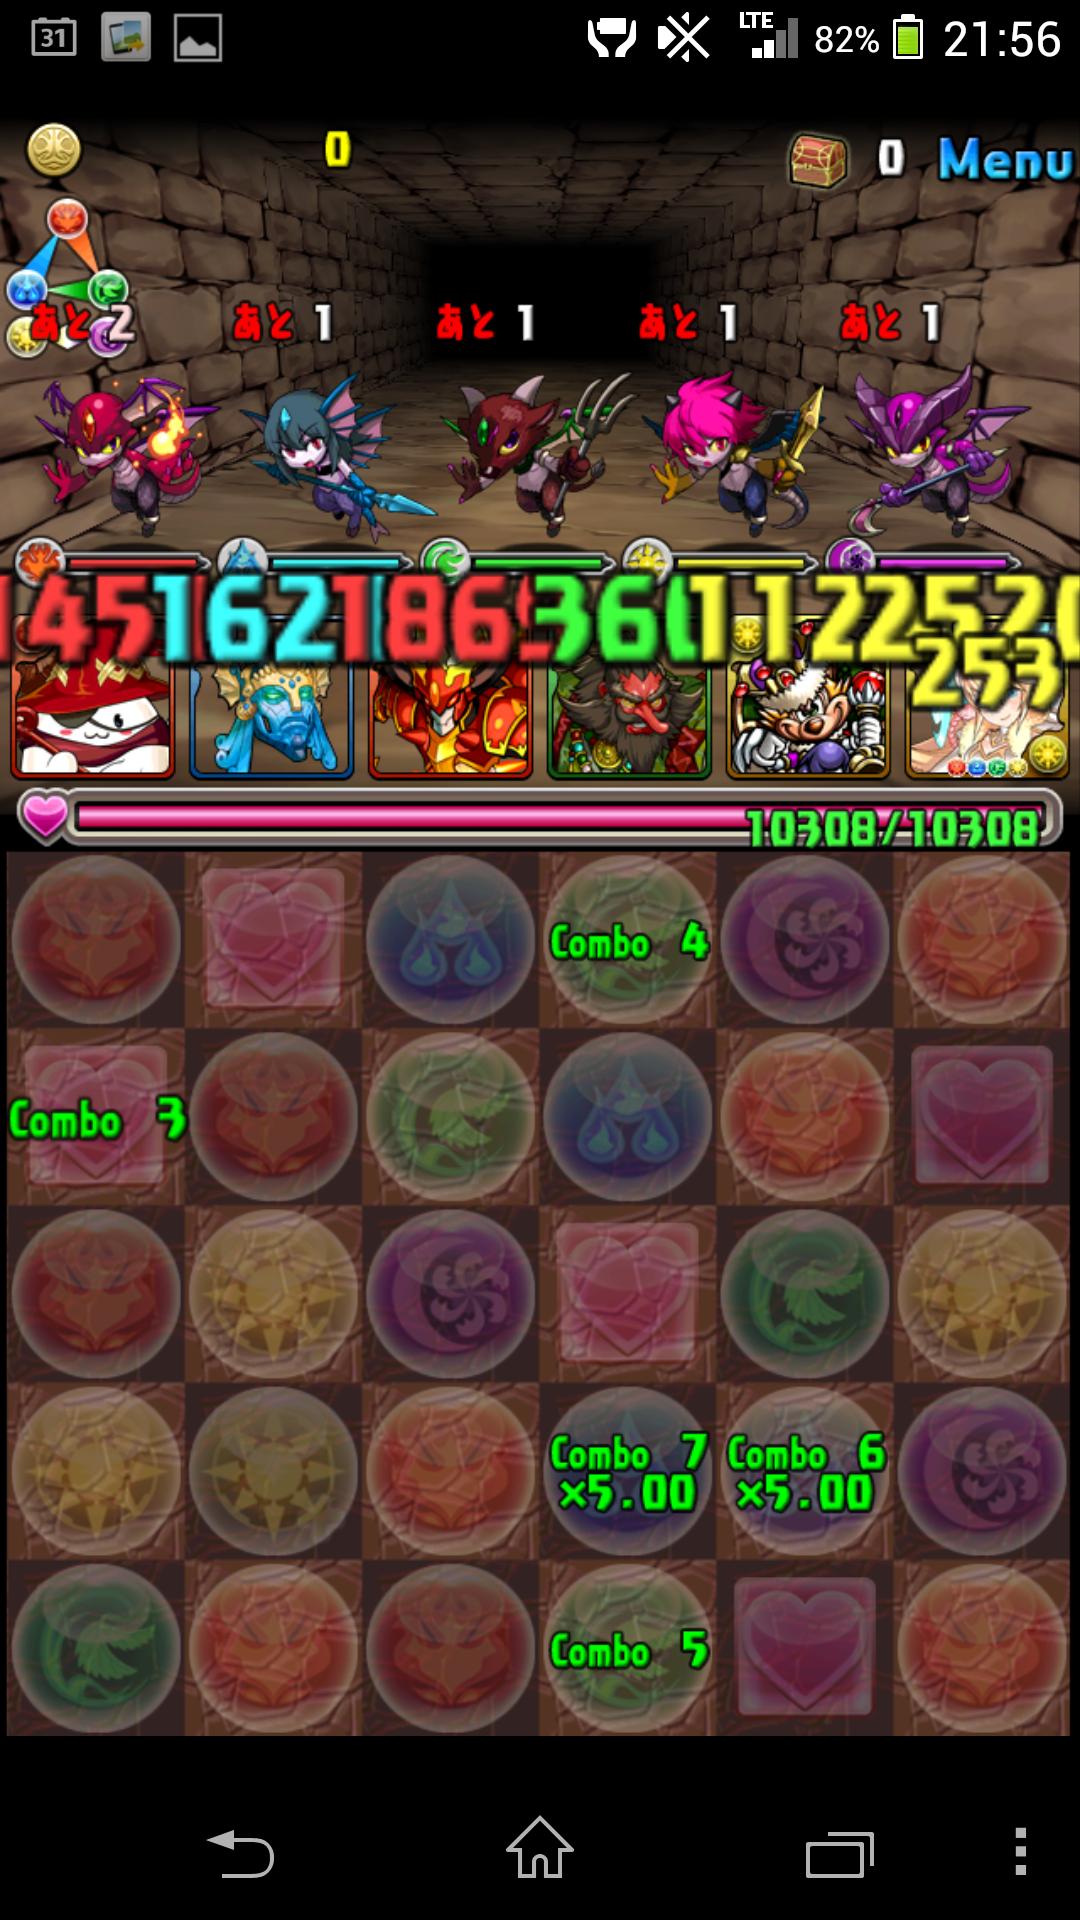 Screenshot_2014-05-12-21-56-35.png